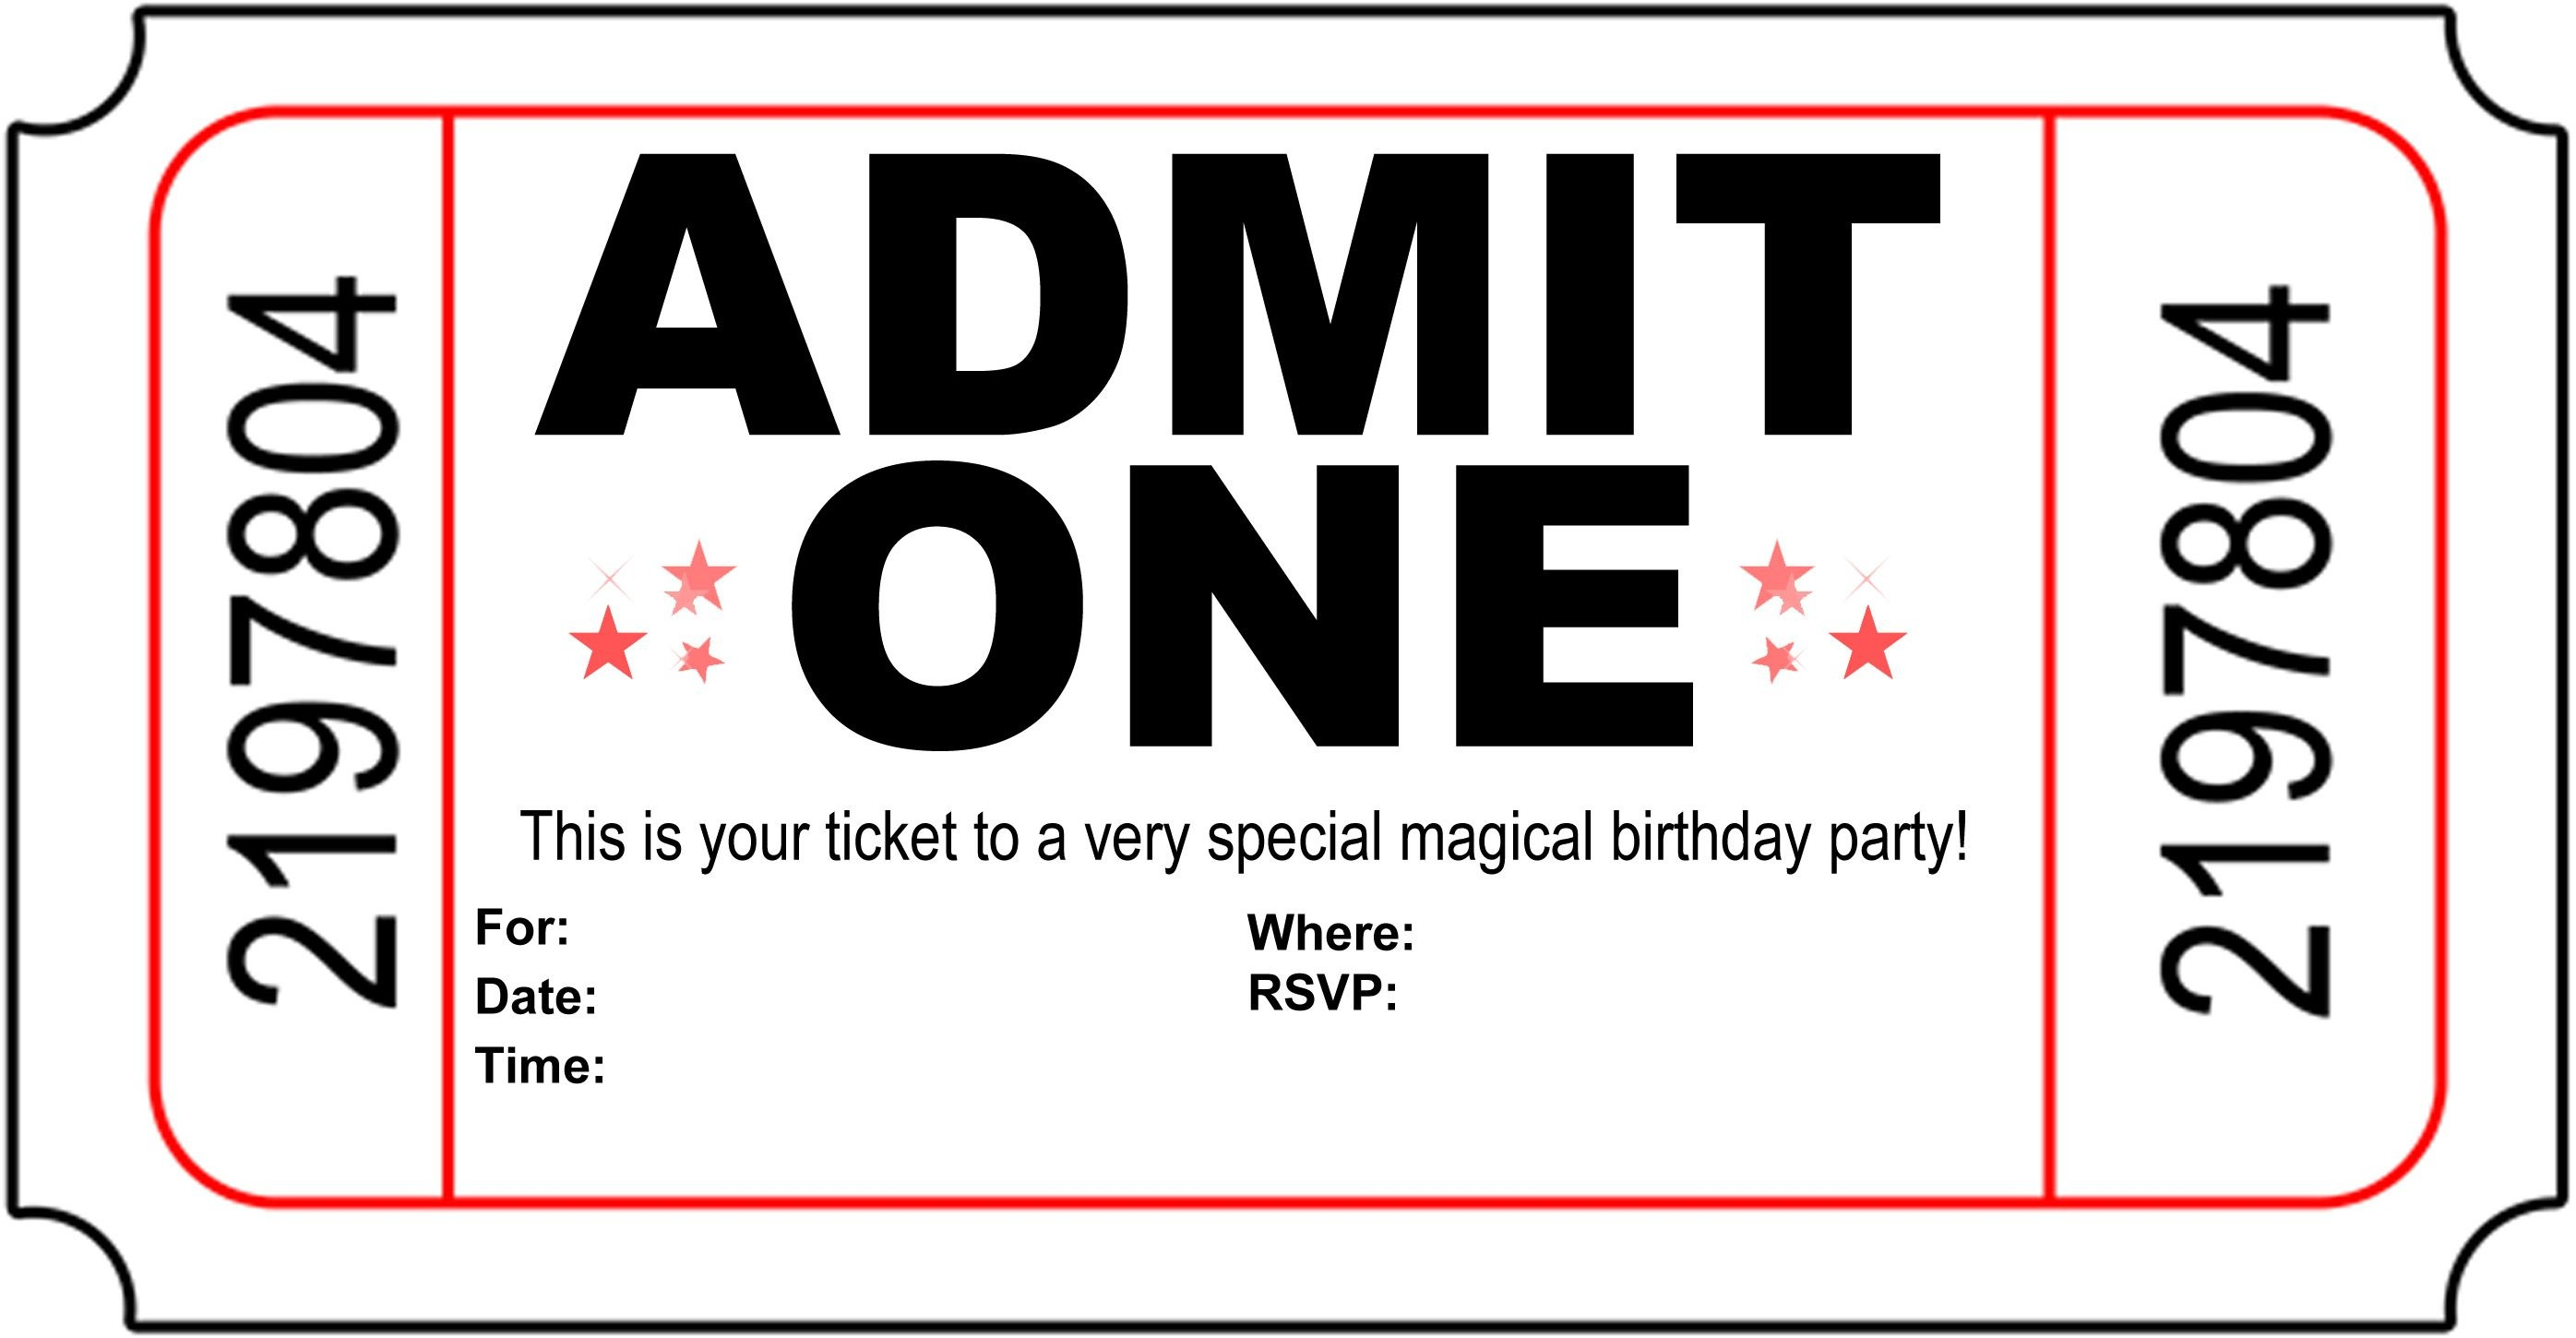 Free Printable Birthday Party Invitations - Kansas Magician   Magic - Free Printable Ticket Invitation Templates